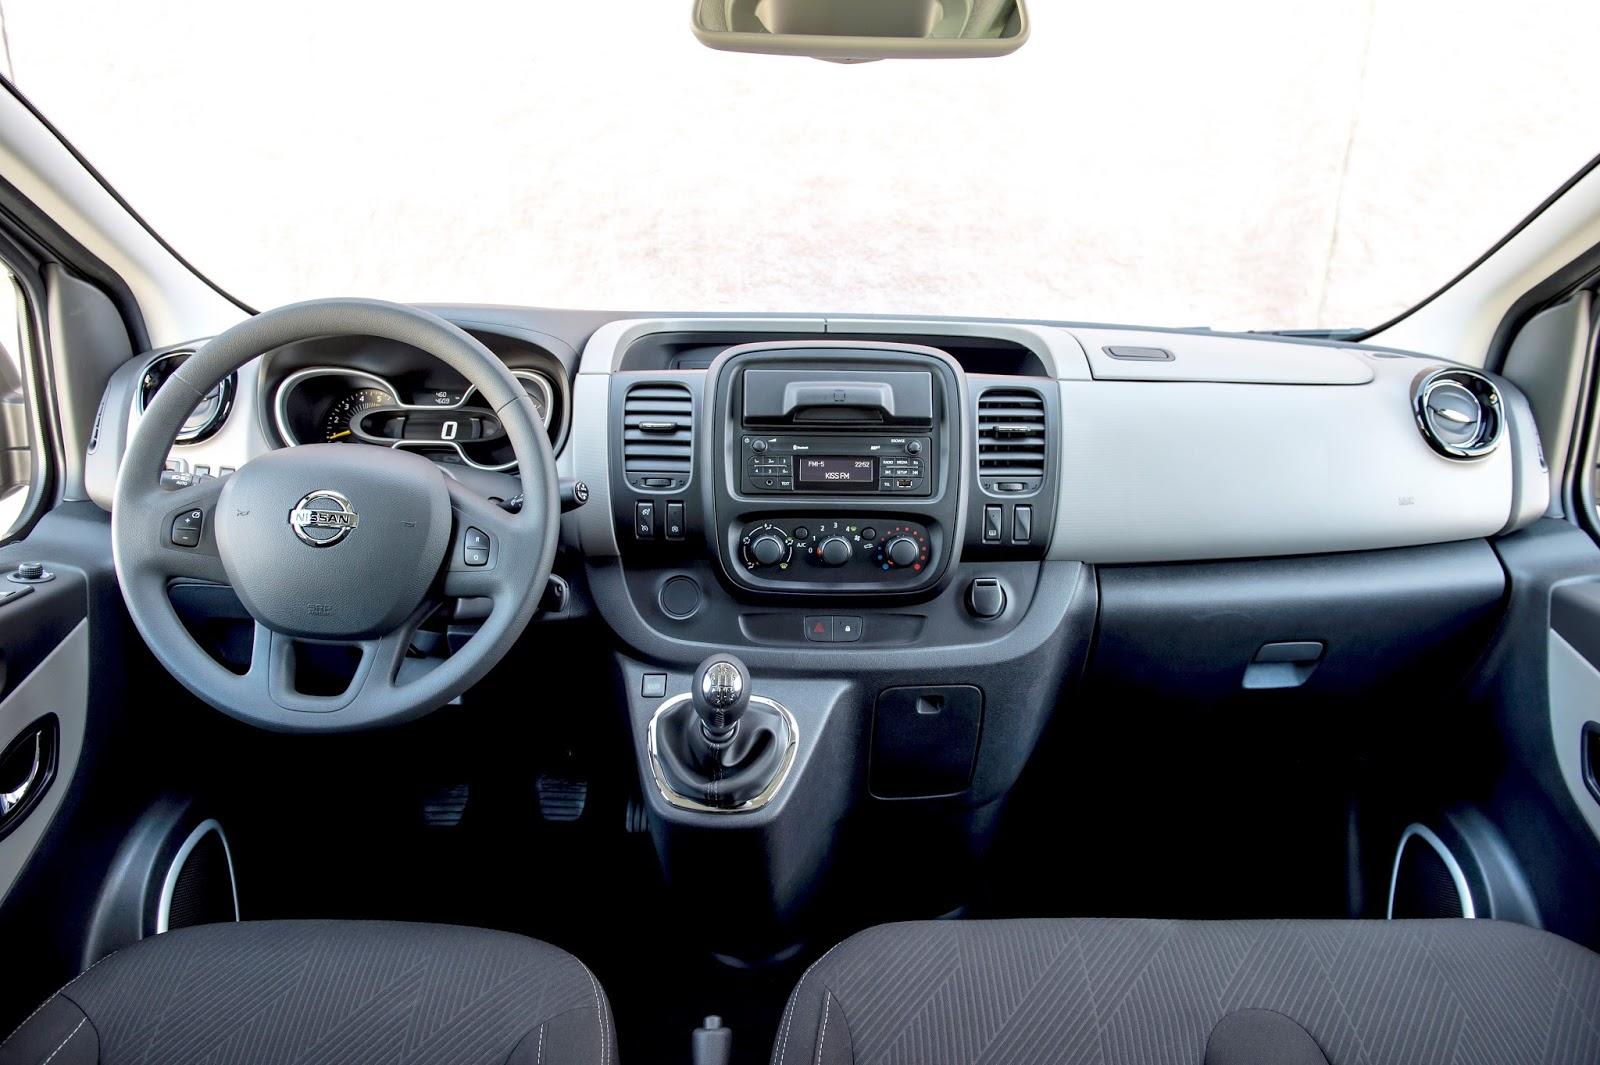 426150085 Nissan NV300 Combi Παγκόσμιο ντεμπούτο για το νέο Nissan NV300 Nissan, Nissan NV, Nissan NV300, Nissan NV400, VAN, videos, Επαγγελματικά